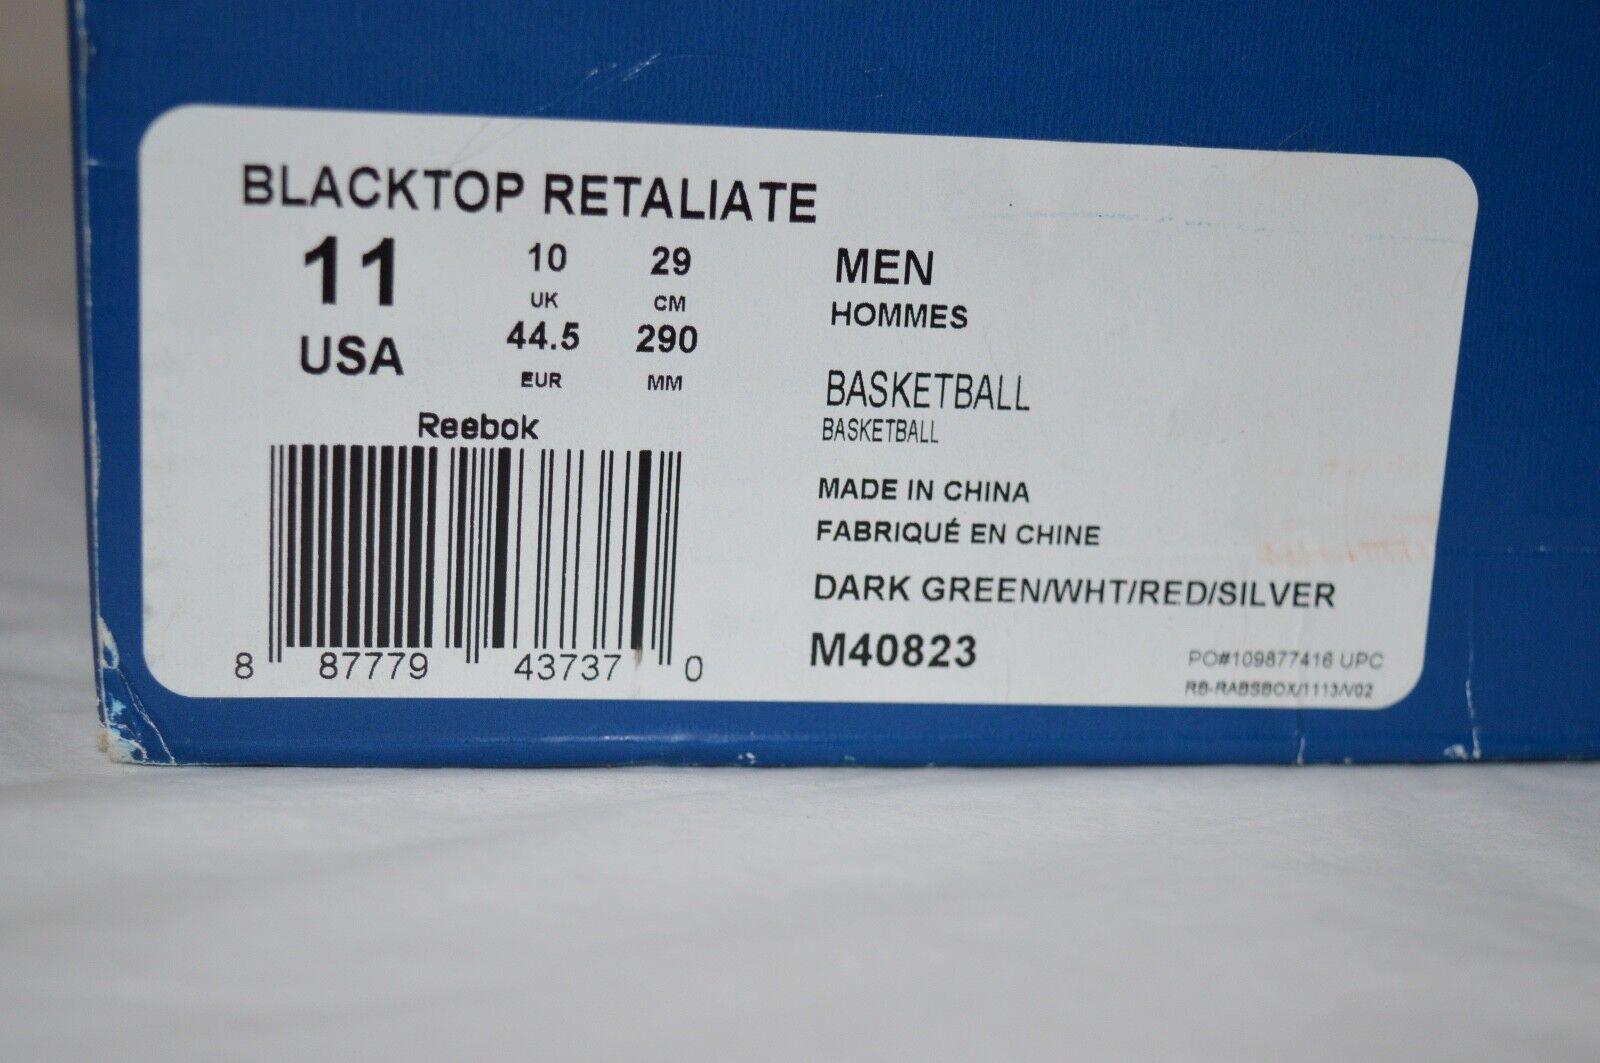 fe7649dc349 VNDS Reebok Blacktop Retaliate PE Boston Pump Dark Green white red silver  Sz 11 for sale online